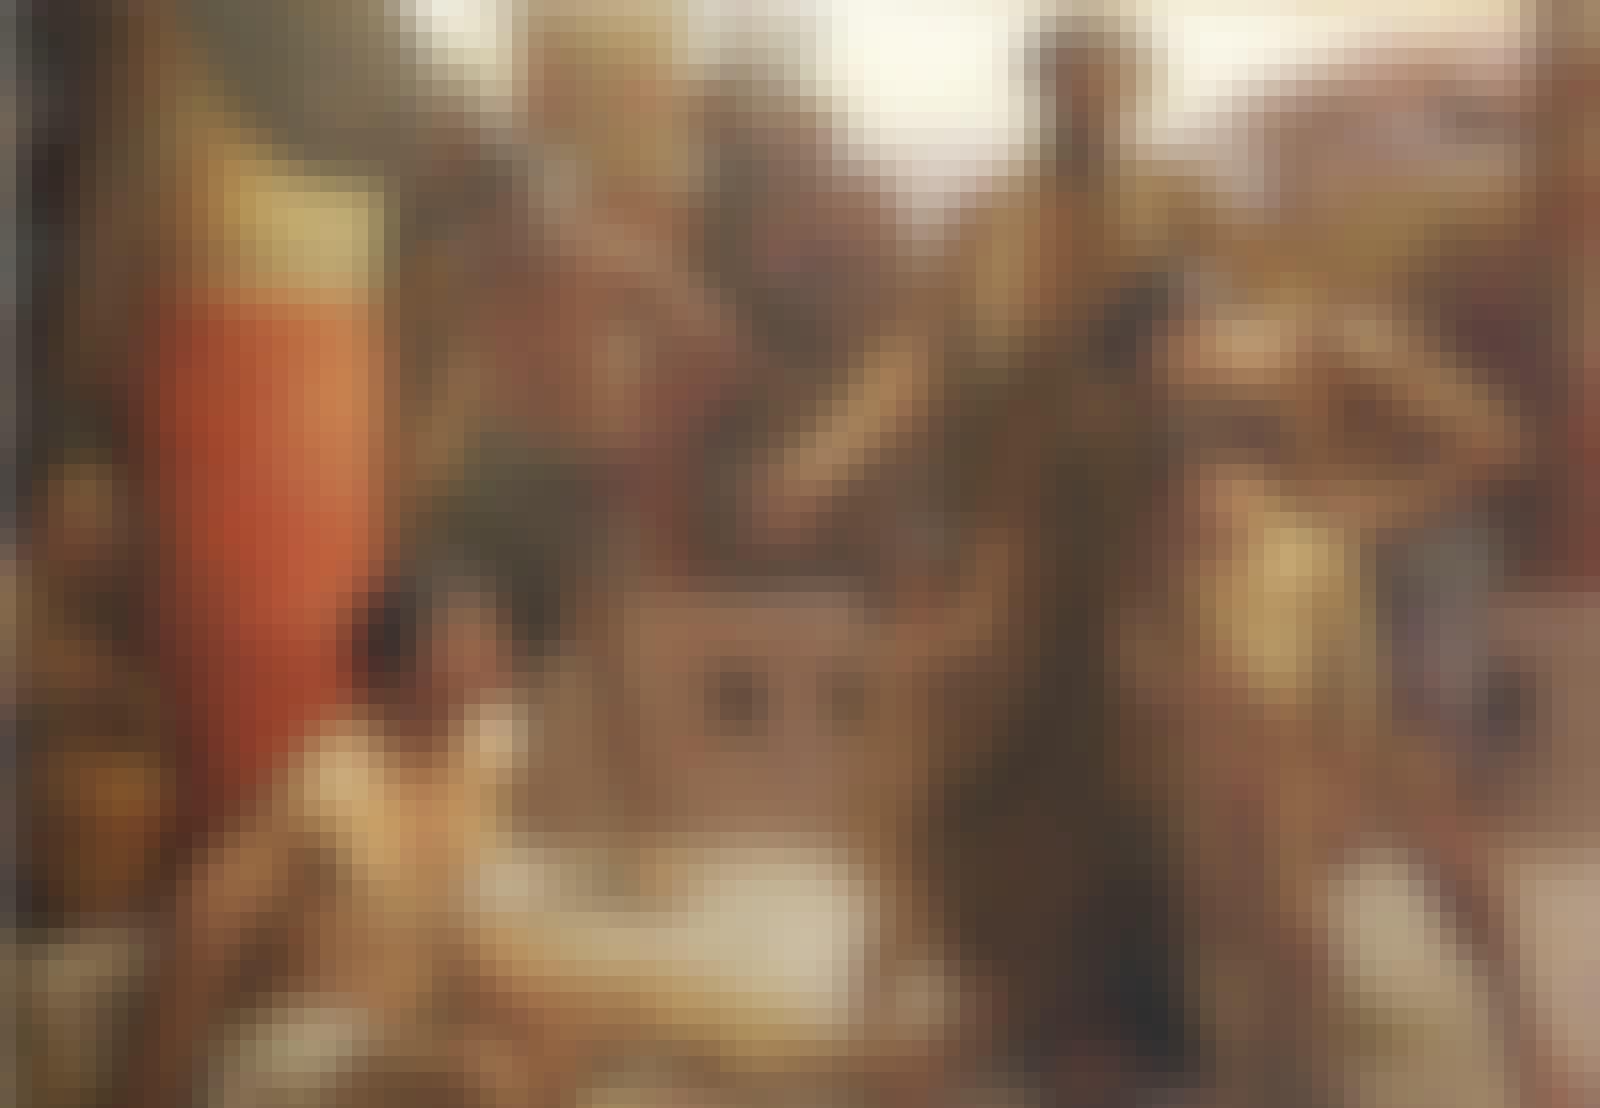 Sparta, antikken, slave